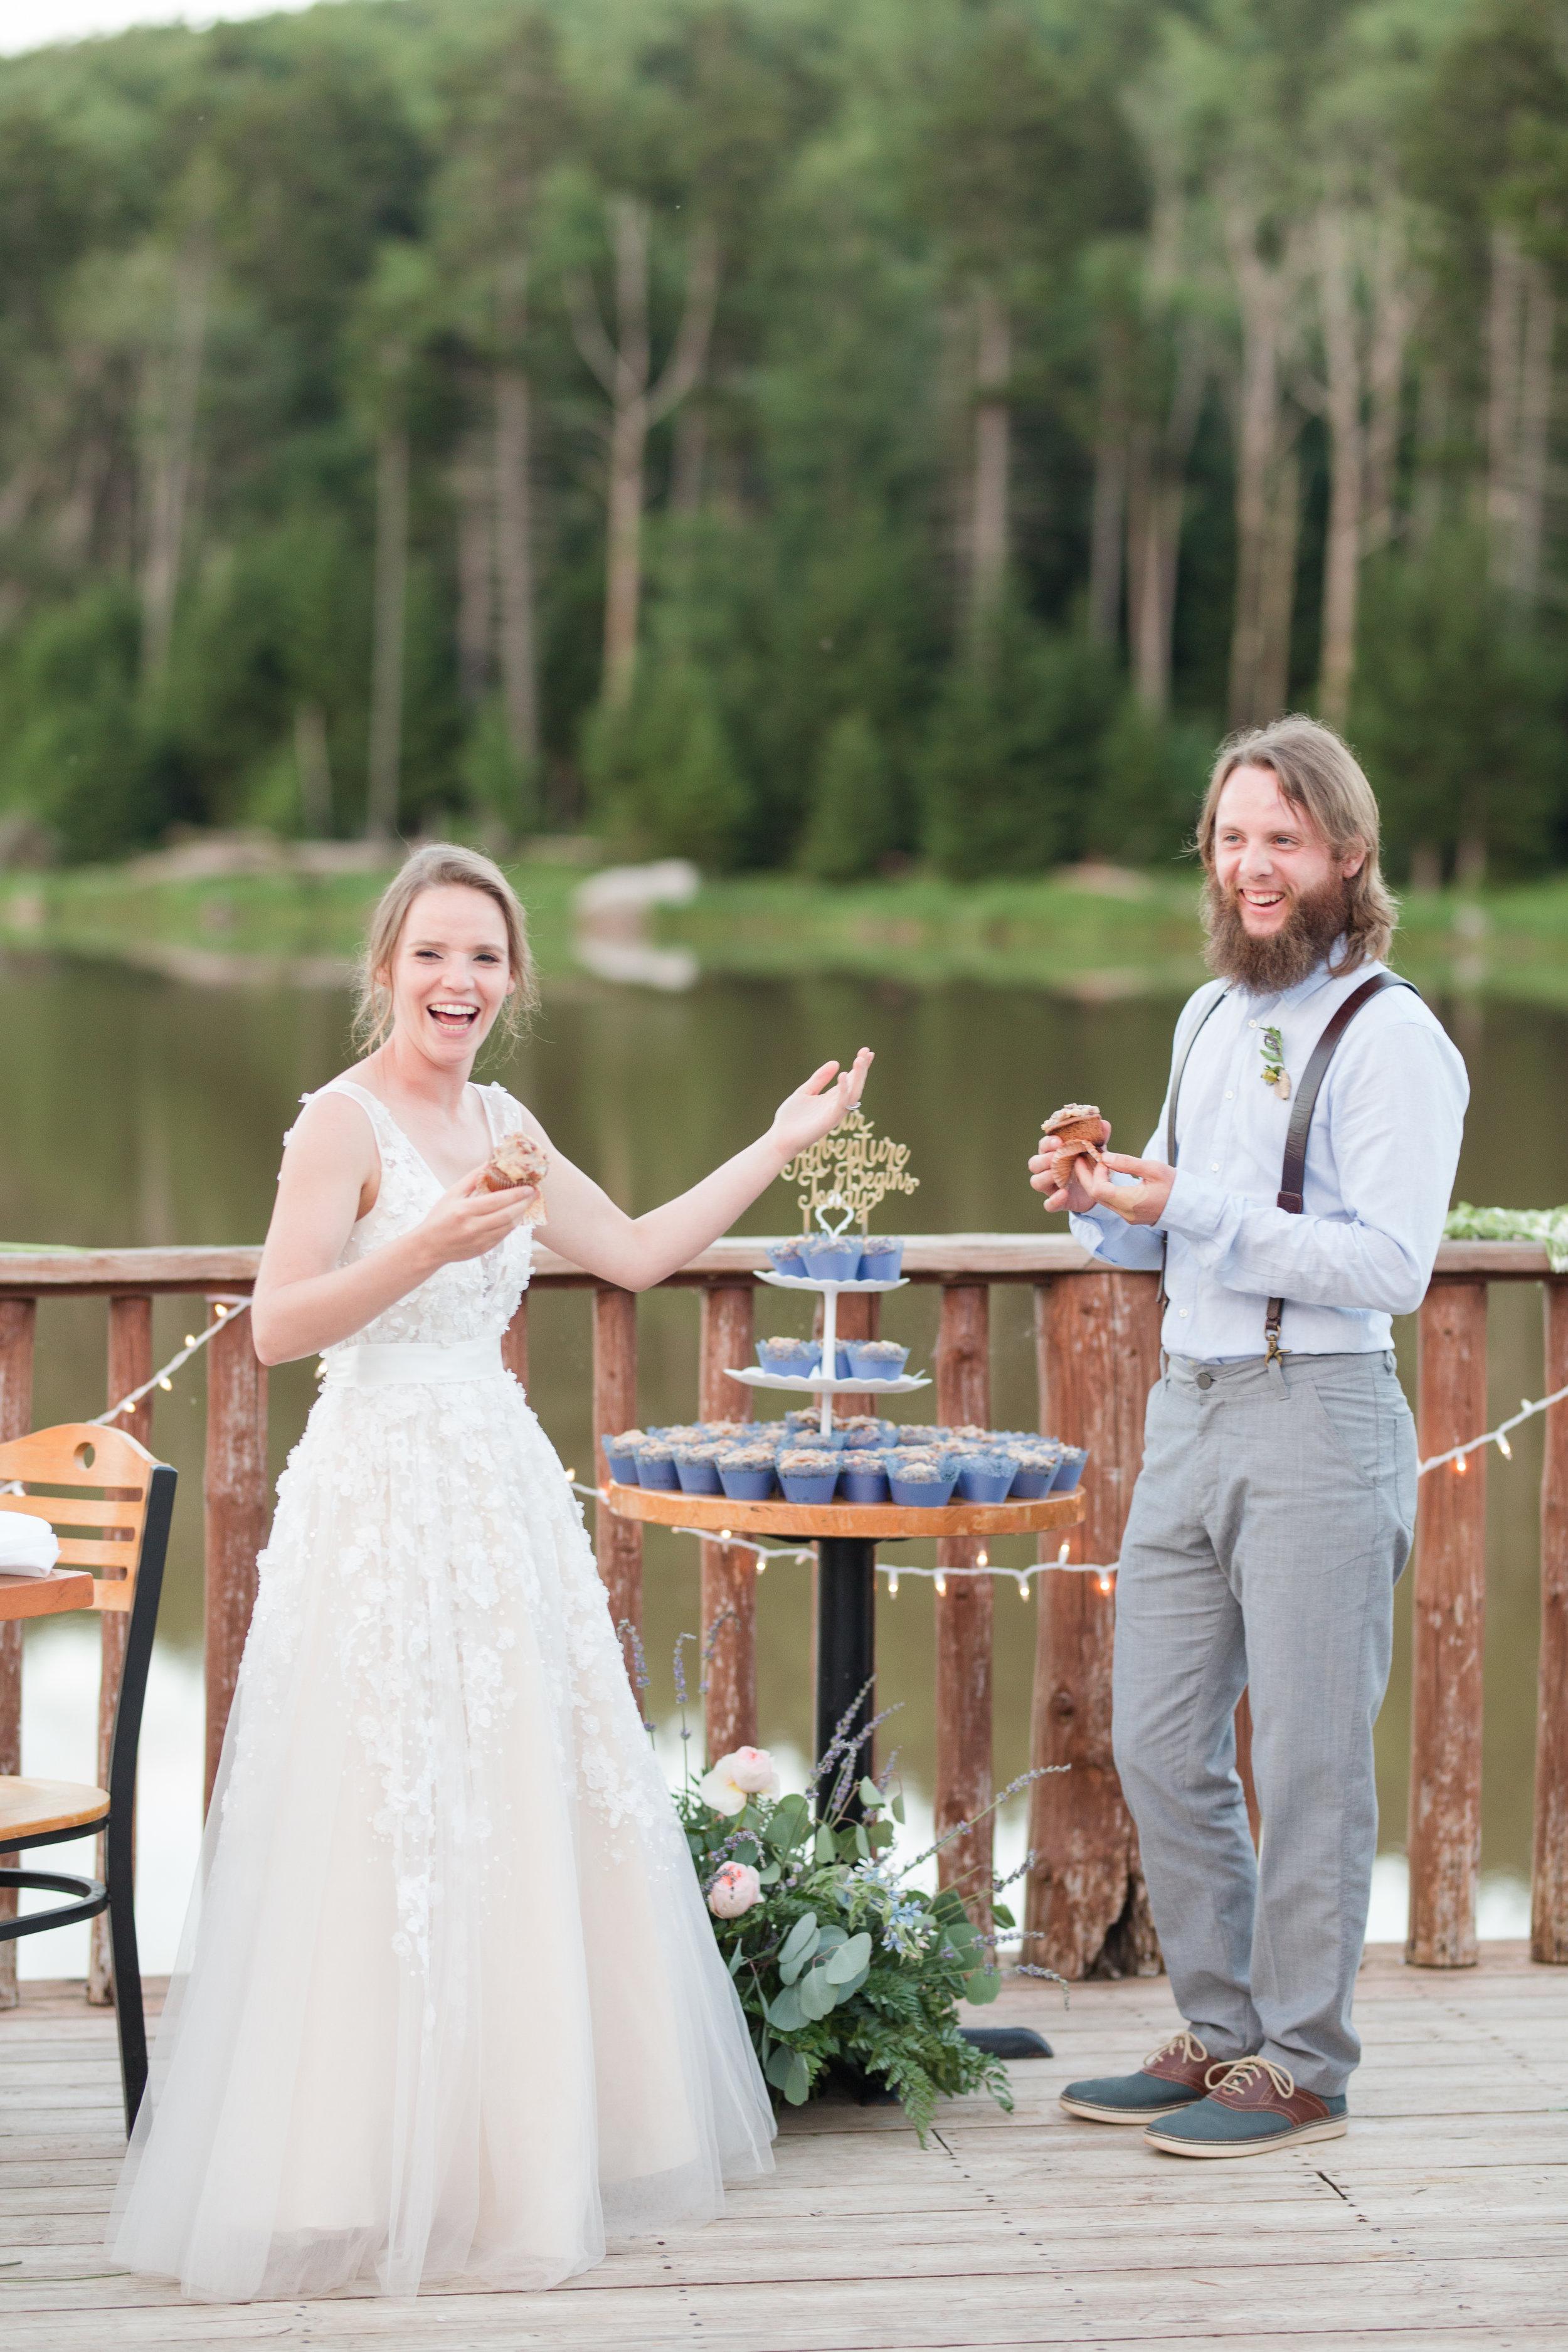 authentic genuine wedding photography in wv, lakeside mountain wedding wv, boathouse snowshoe resort